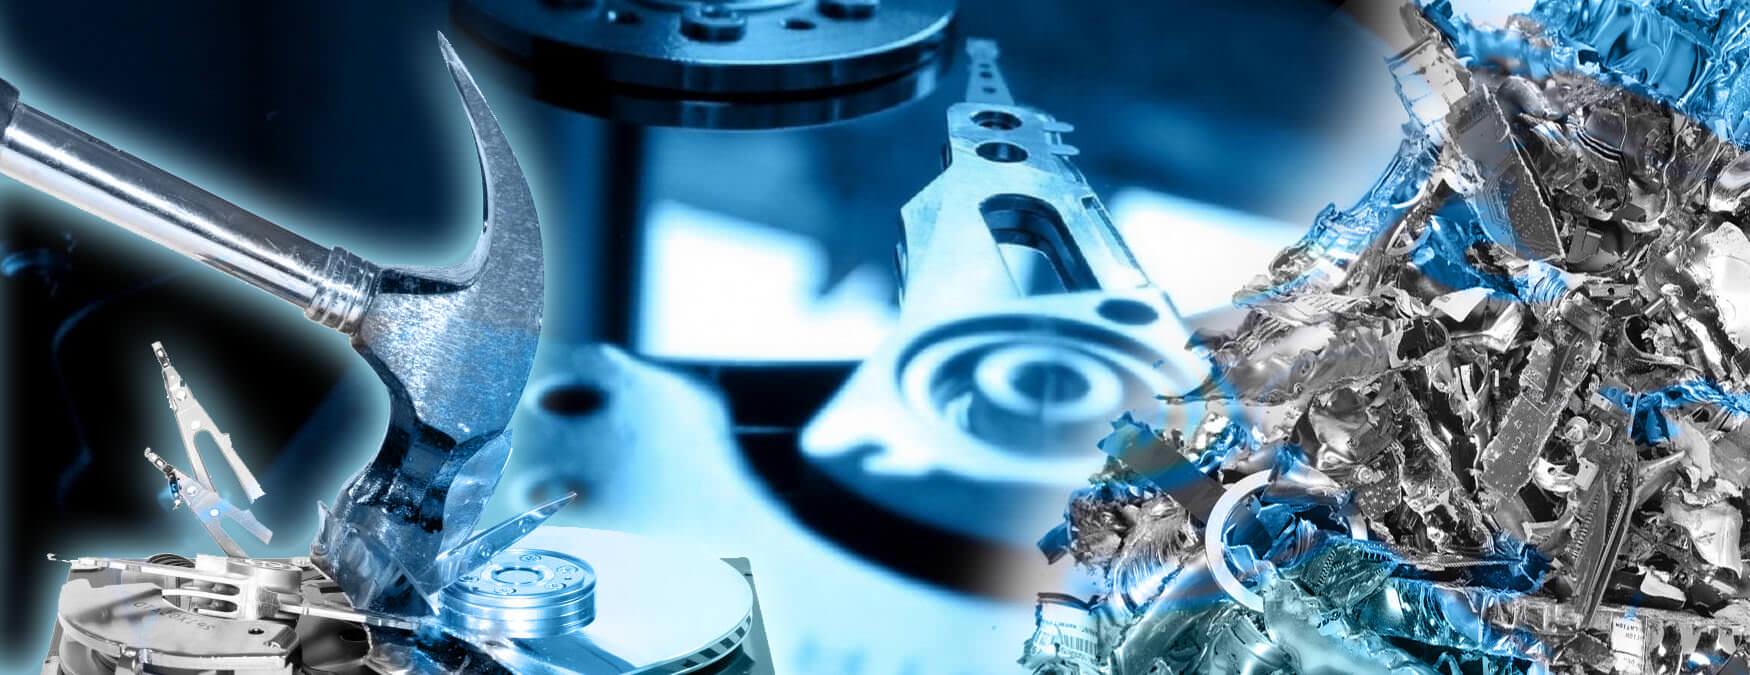 Secure Hard Drive Shredding - AGR